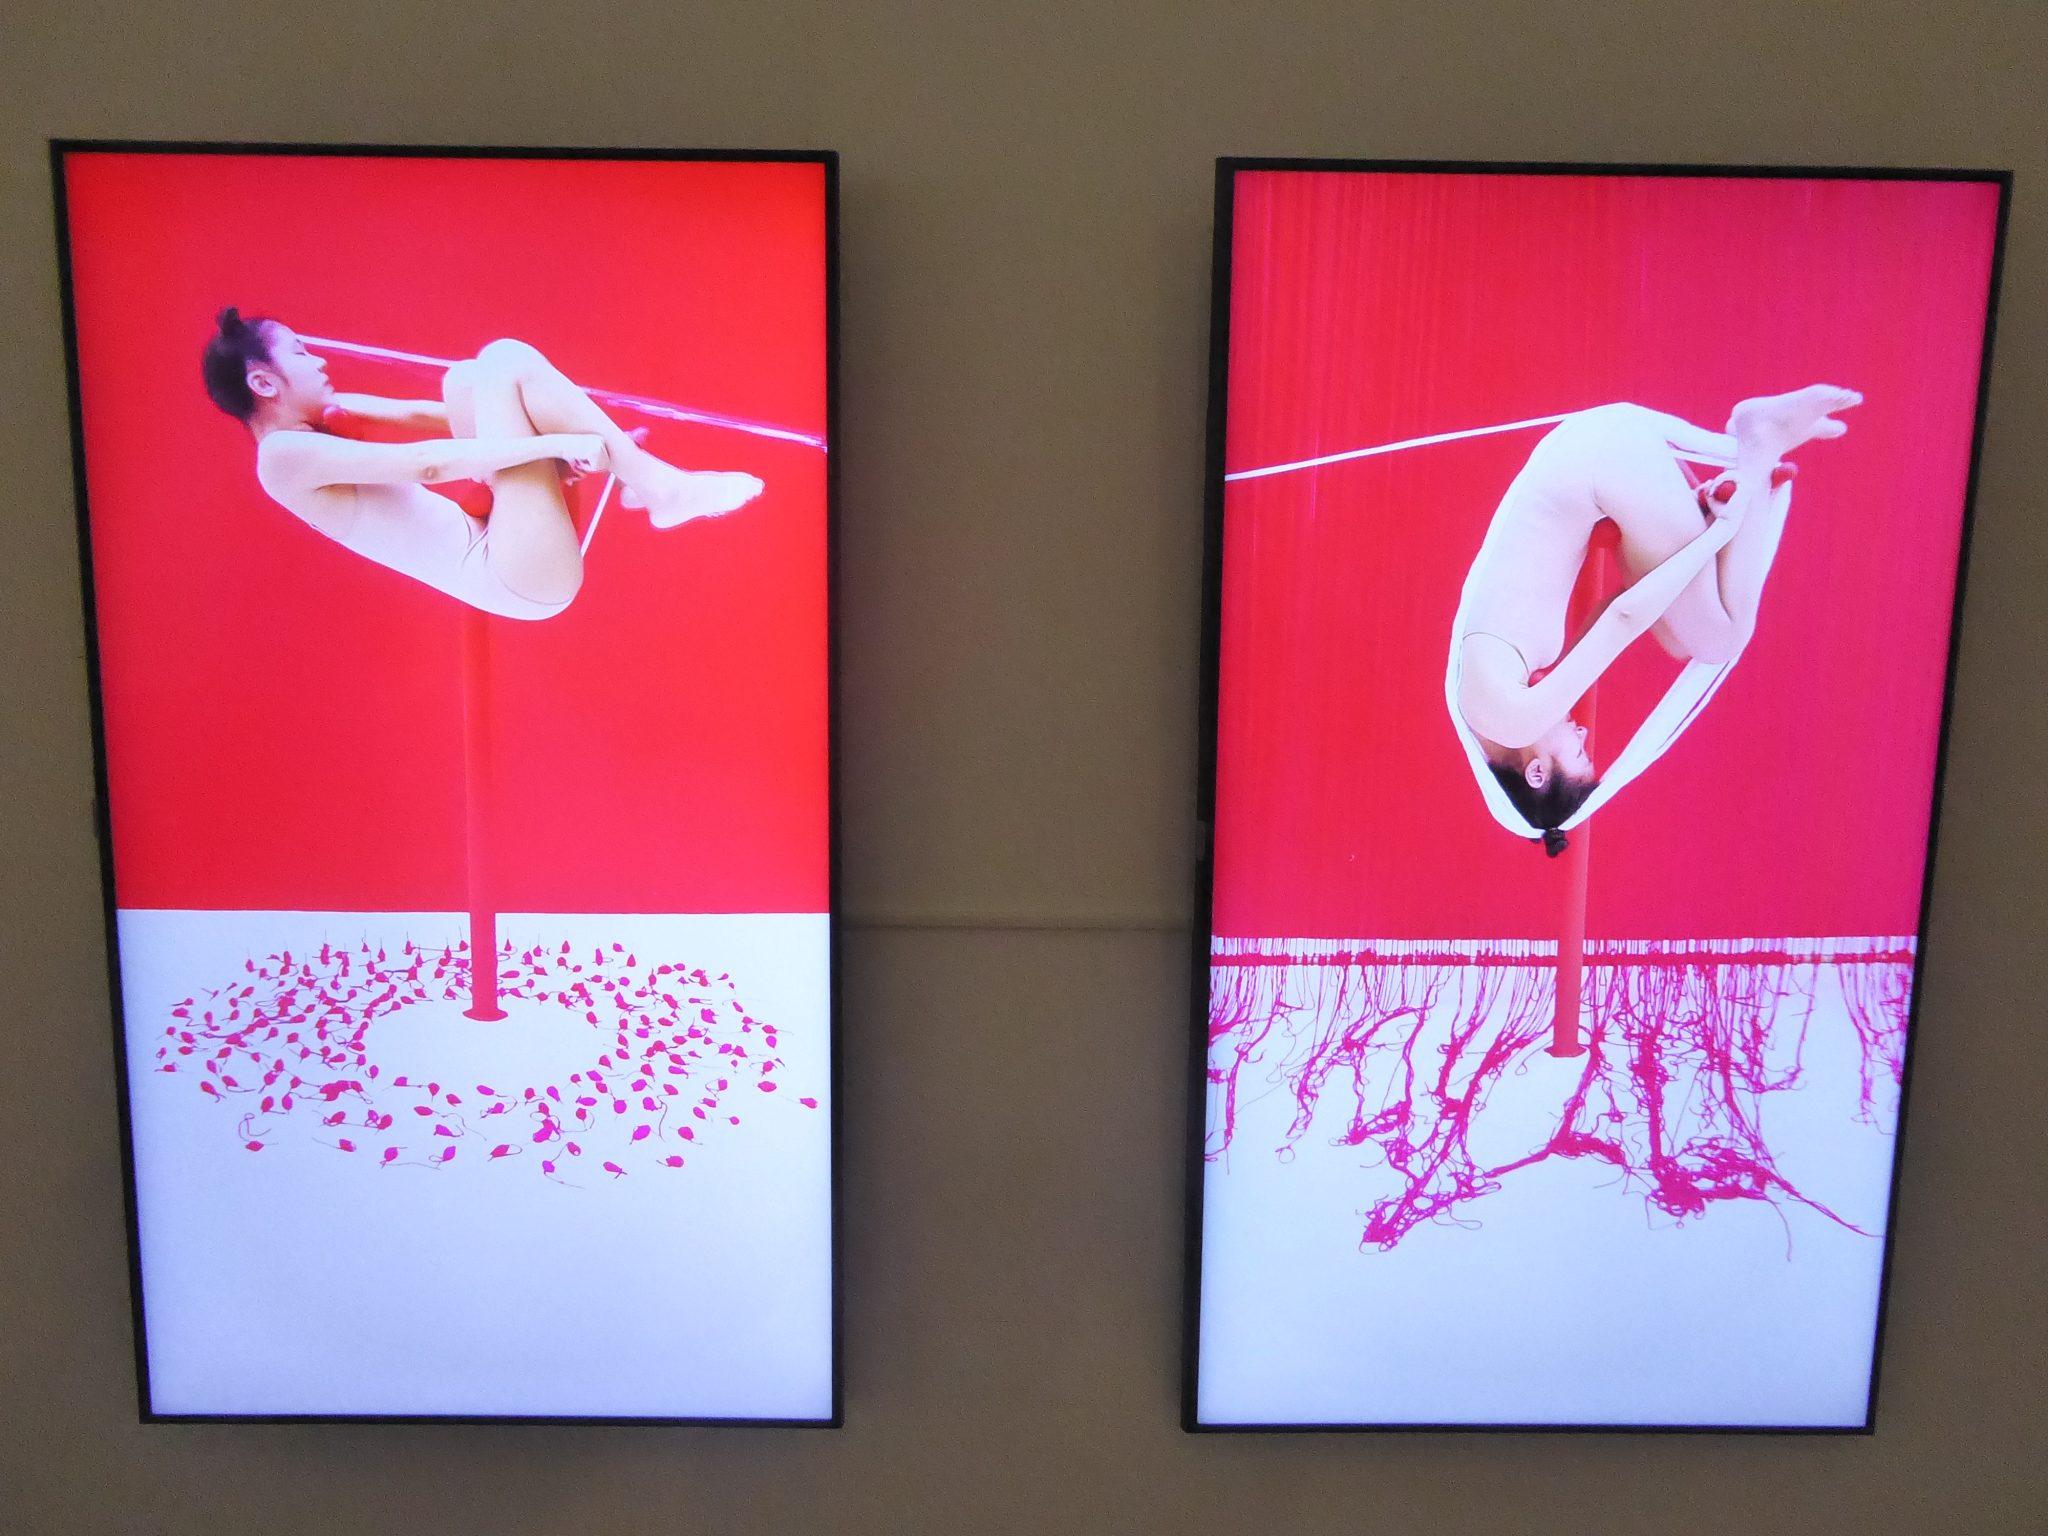 Kawita Vatanajyankur at Bangkok art biennale